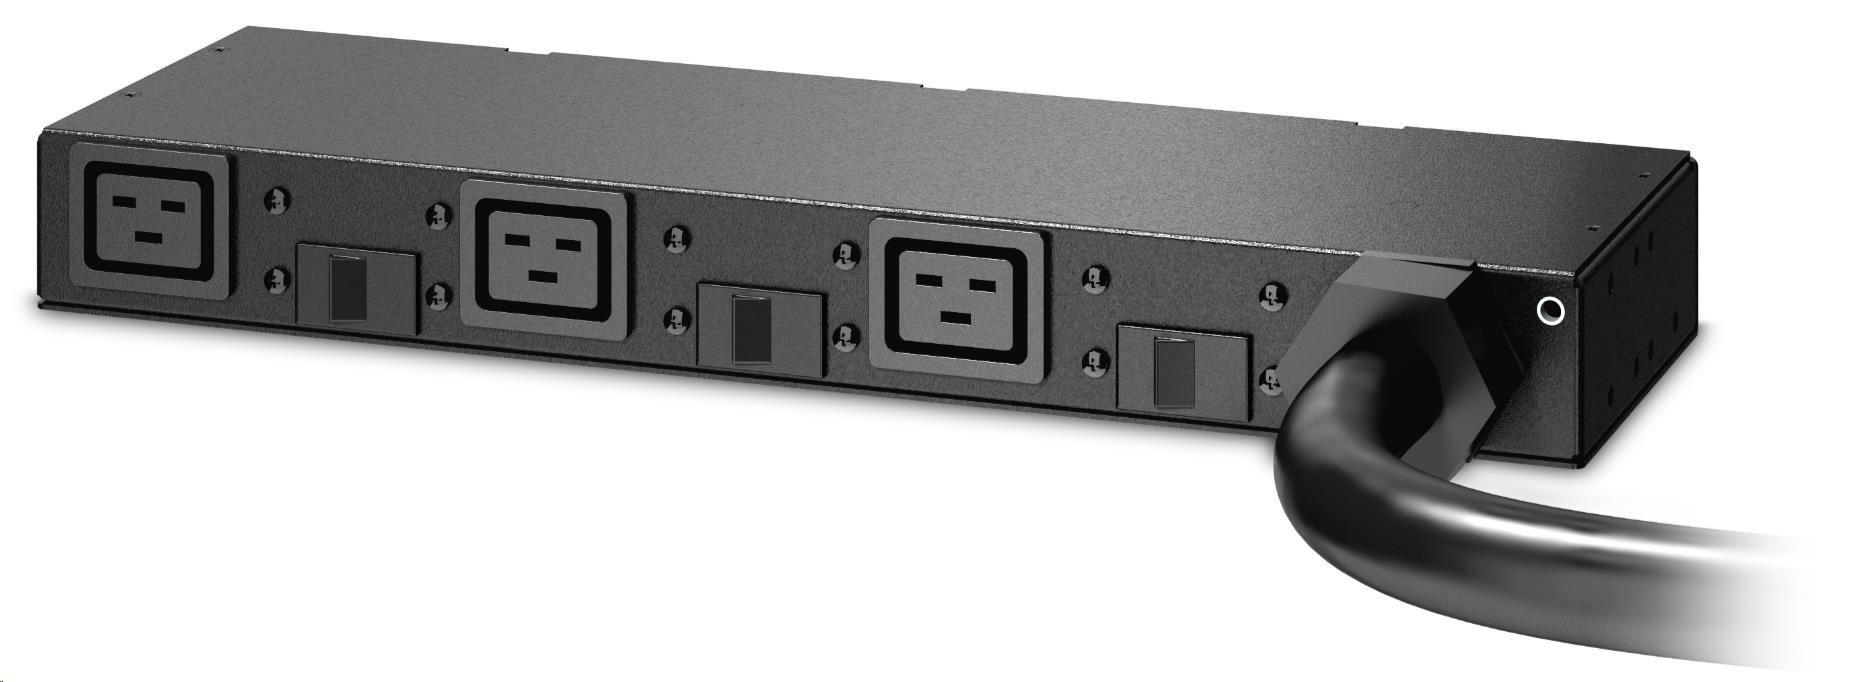 APC Rack PDU, Basic, 0U/1U, 220-240V, 63A, (3) C19, IEC 309 3.66m